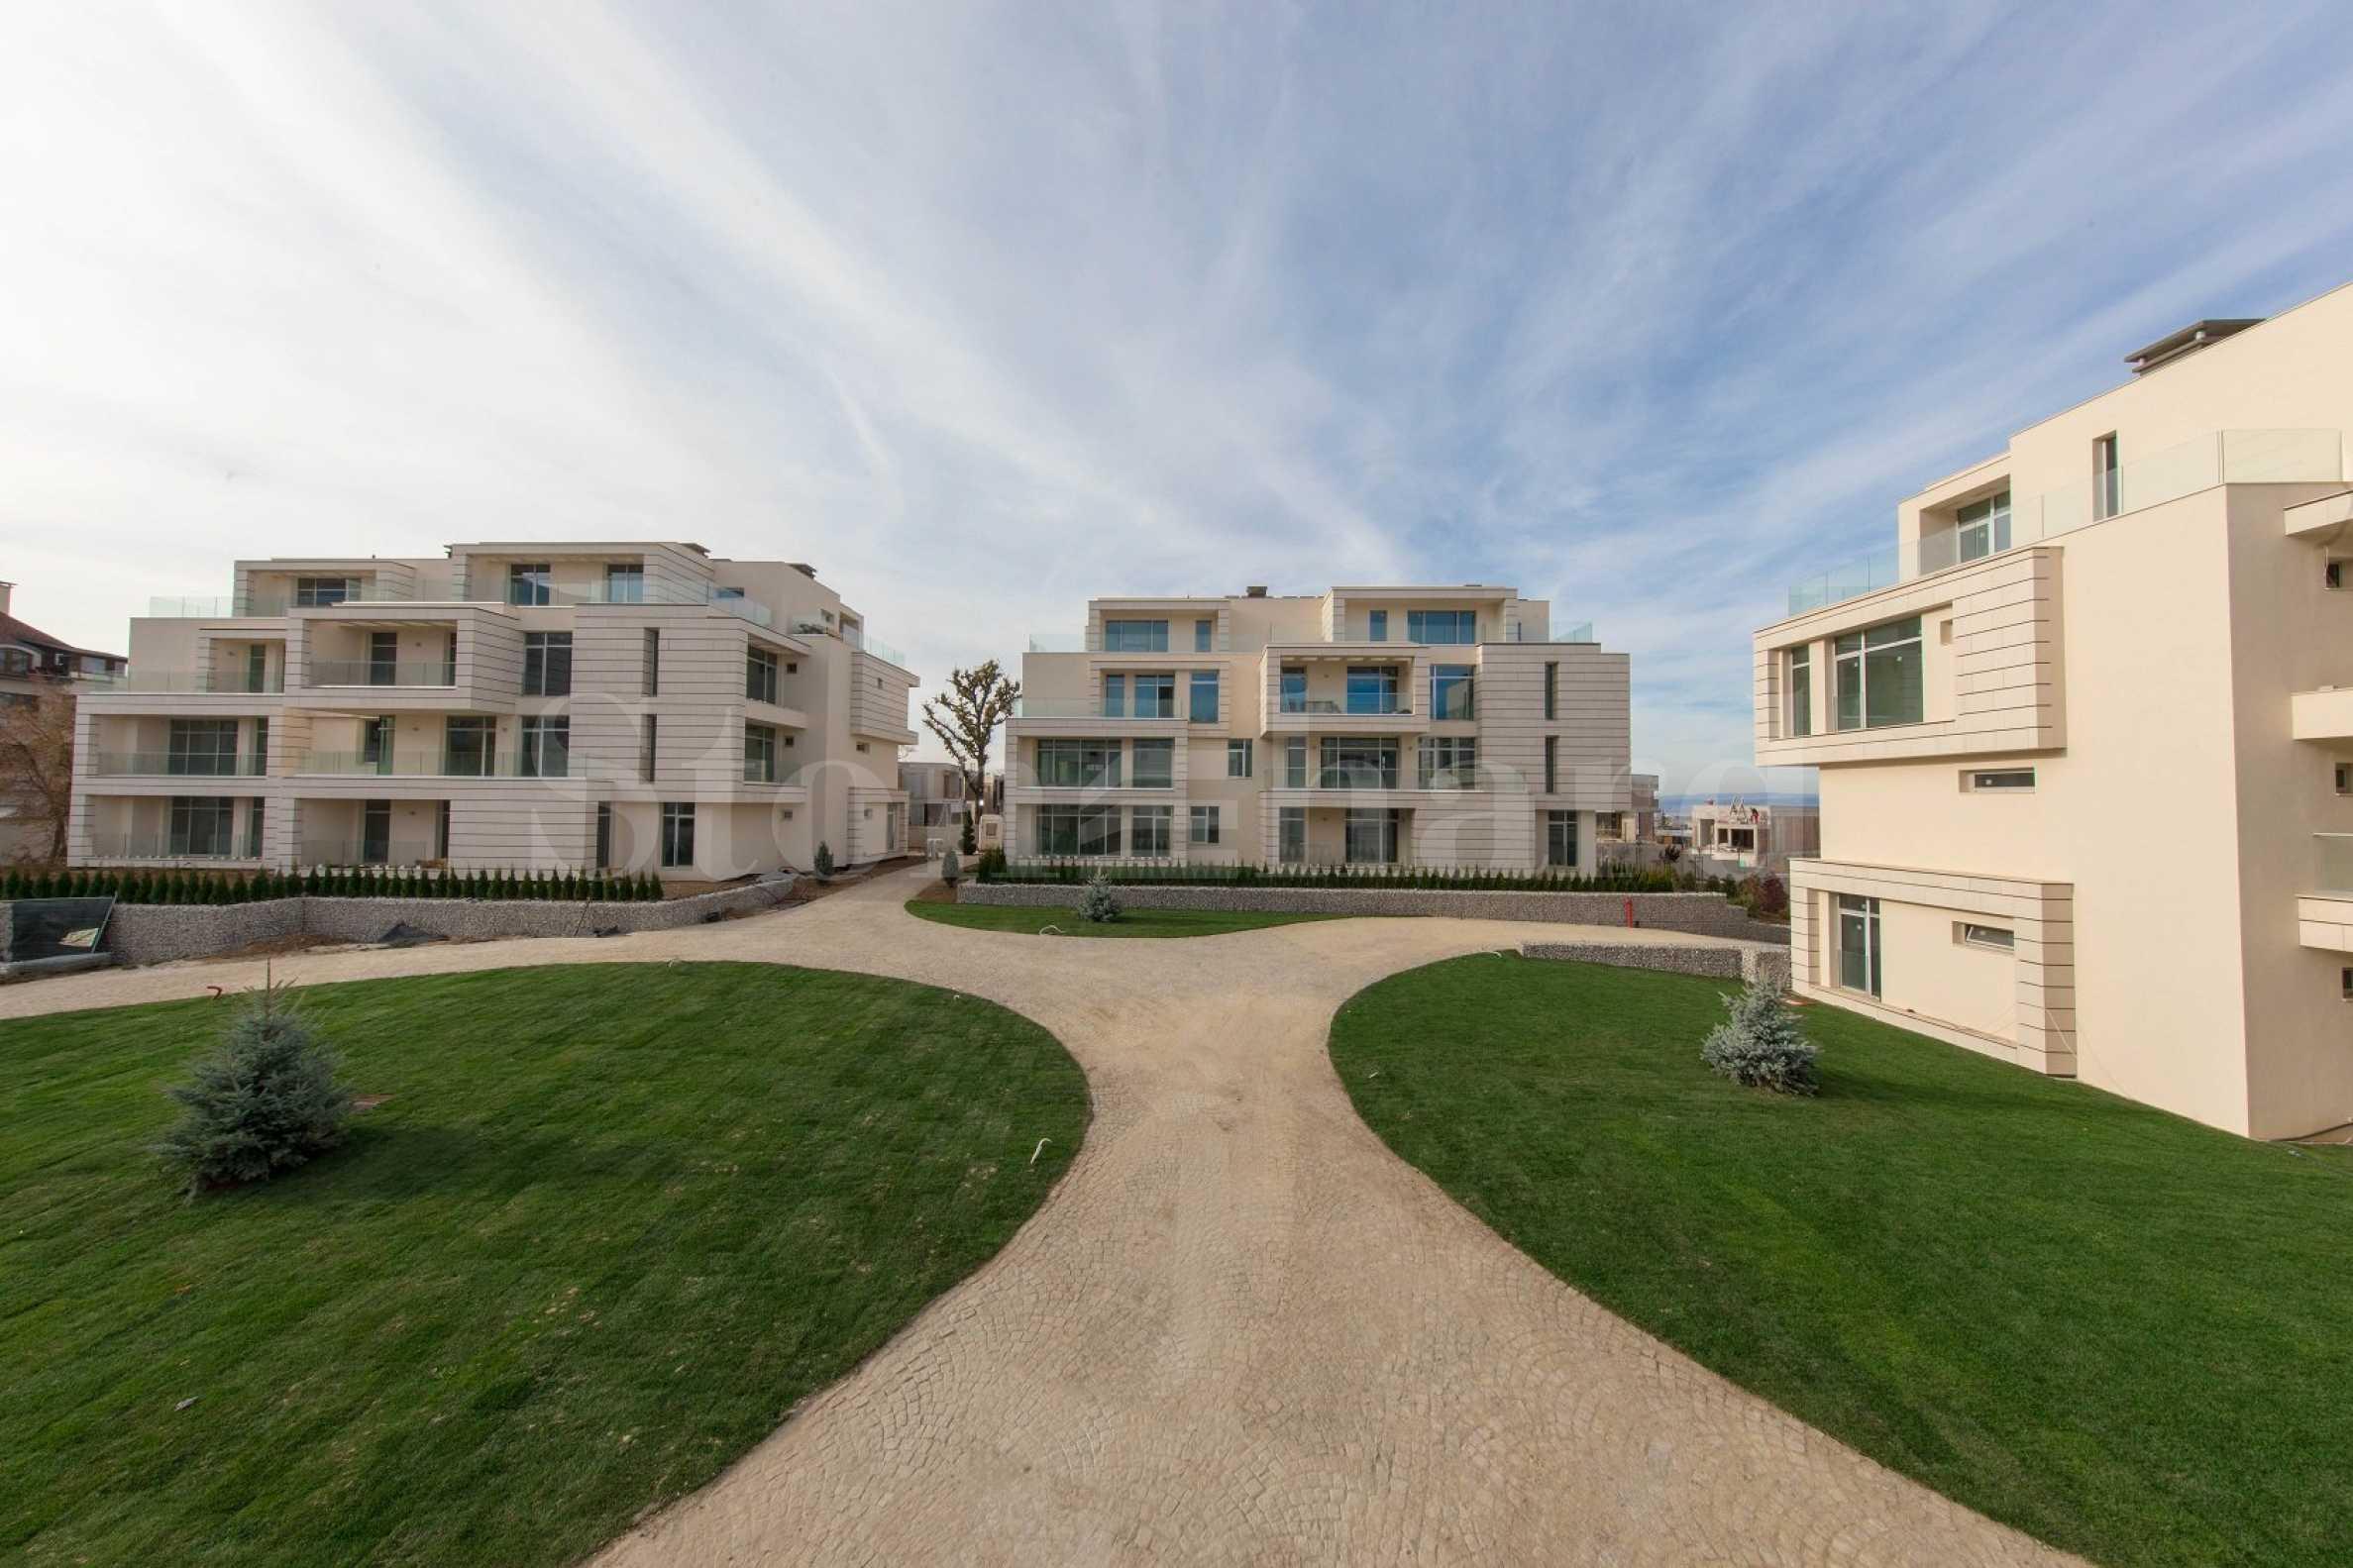 Луксозен комплекс Royal Park с огромна паркова зона2 - Stonehard